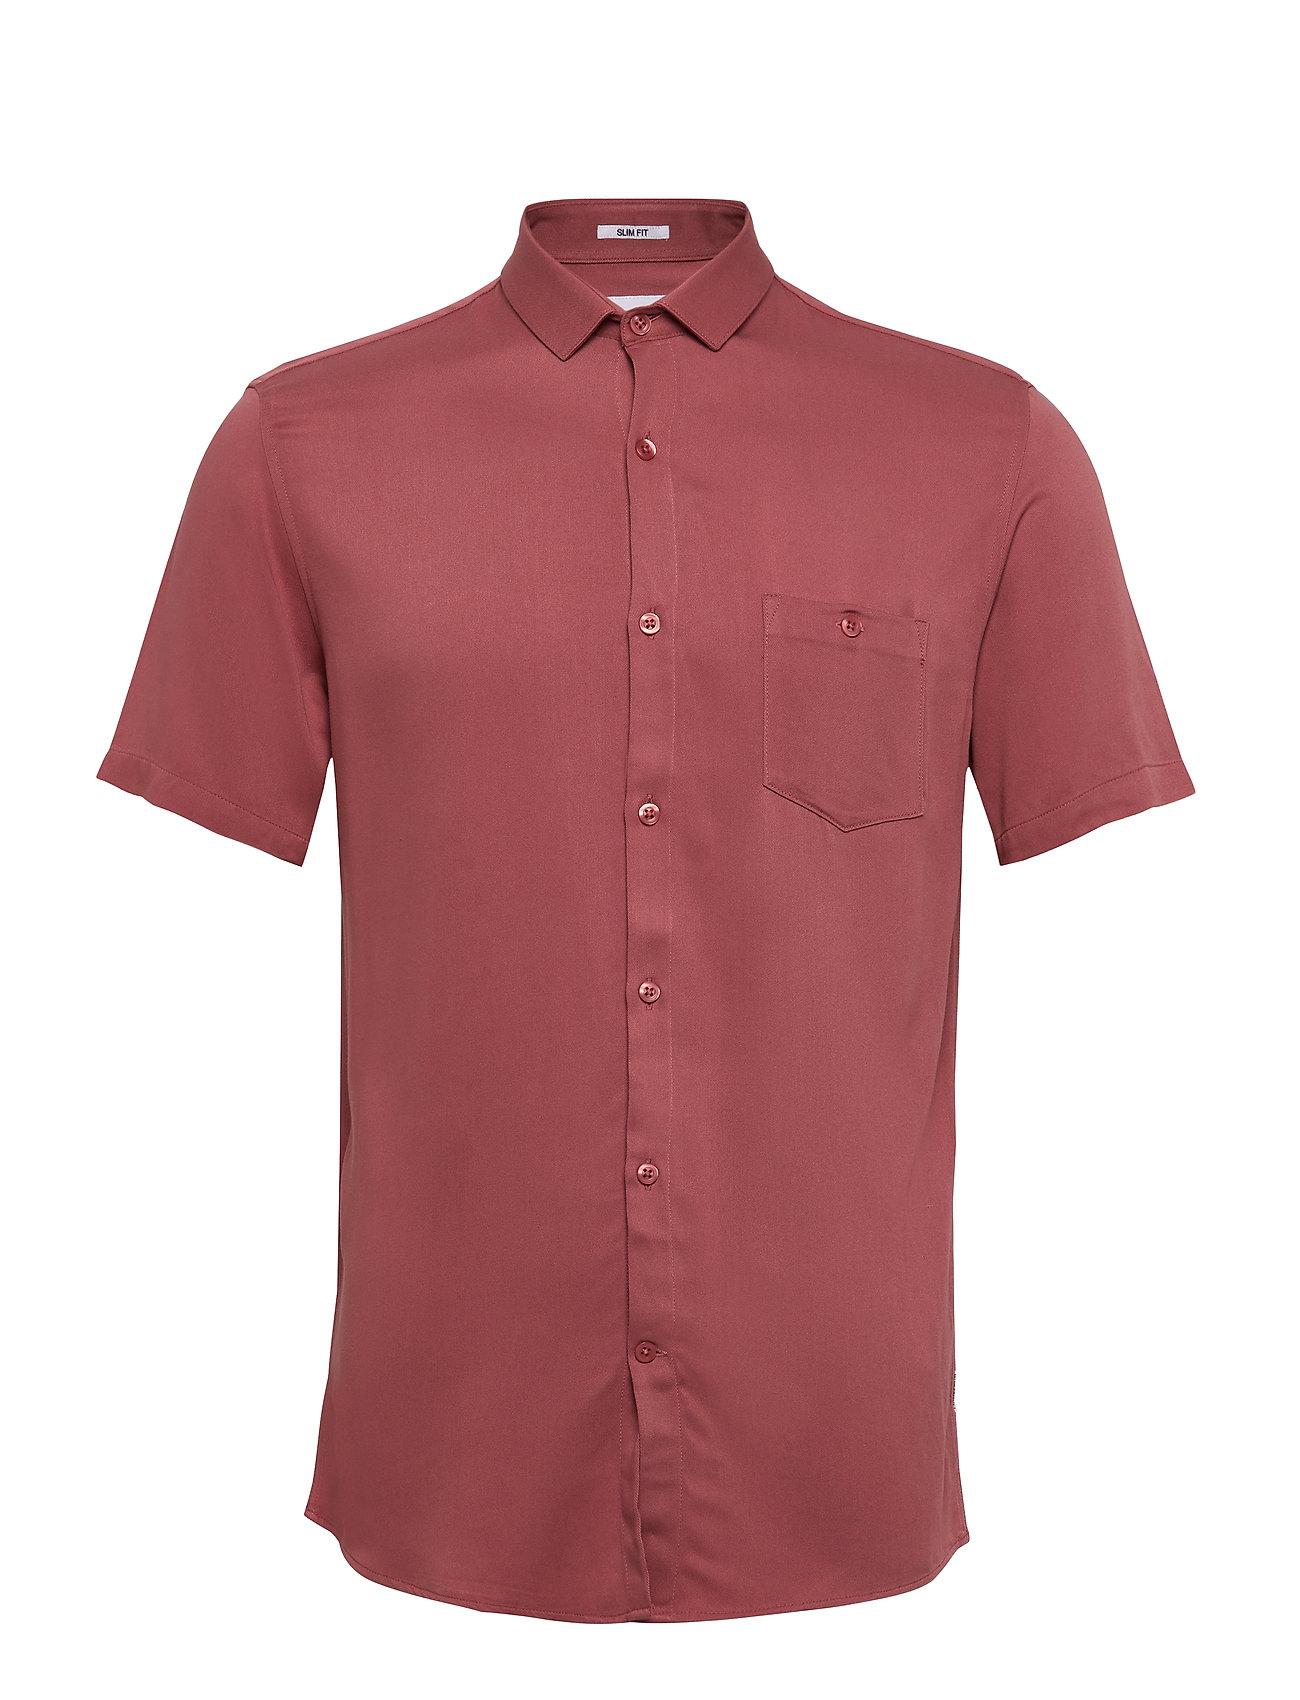 Lindbergh Viscose shirt S/S - ROSE